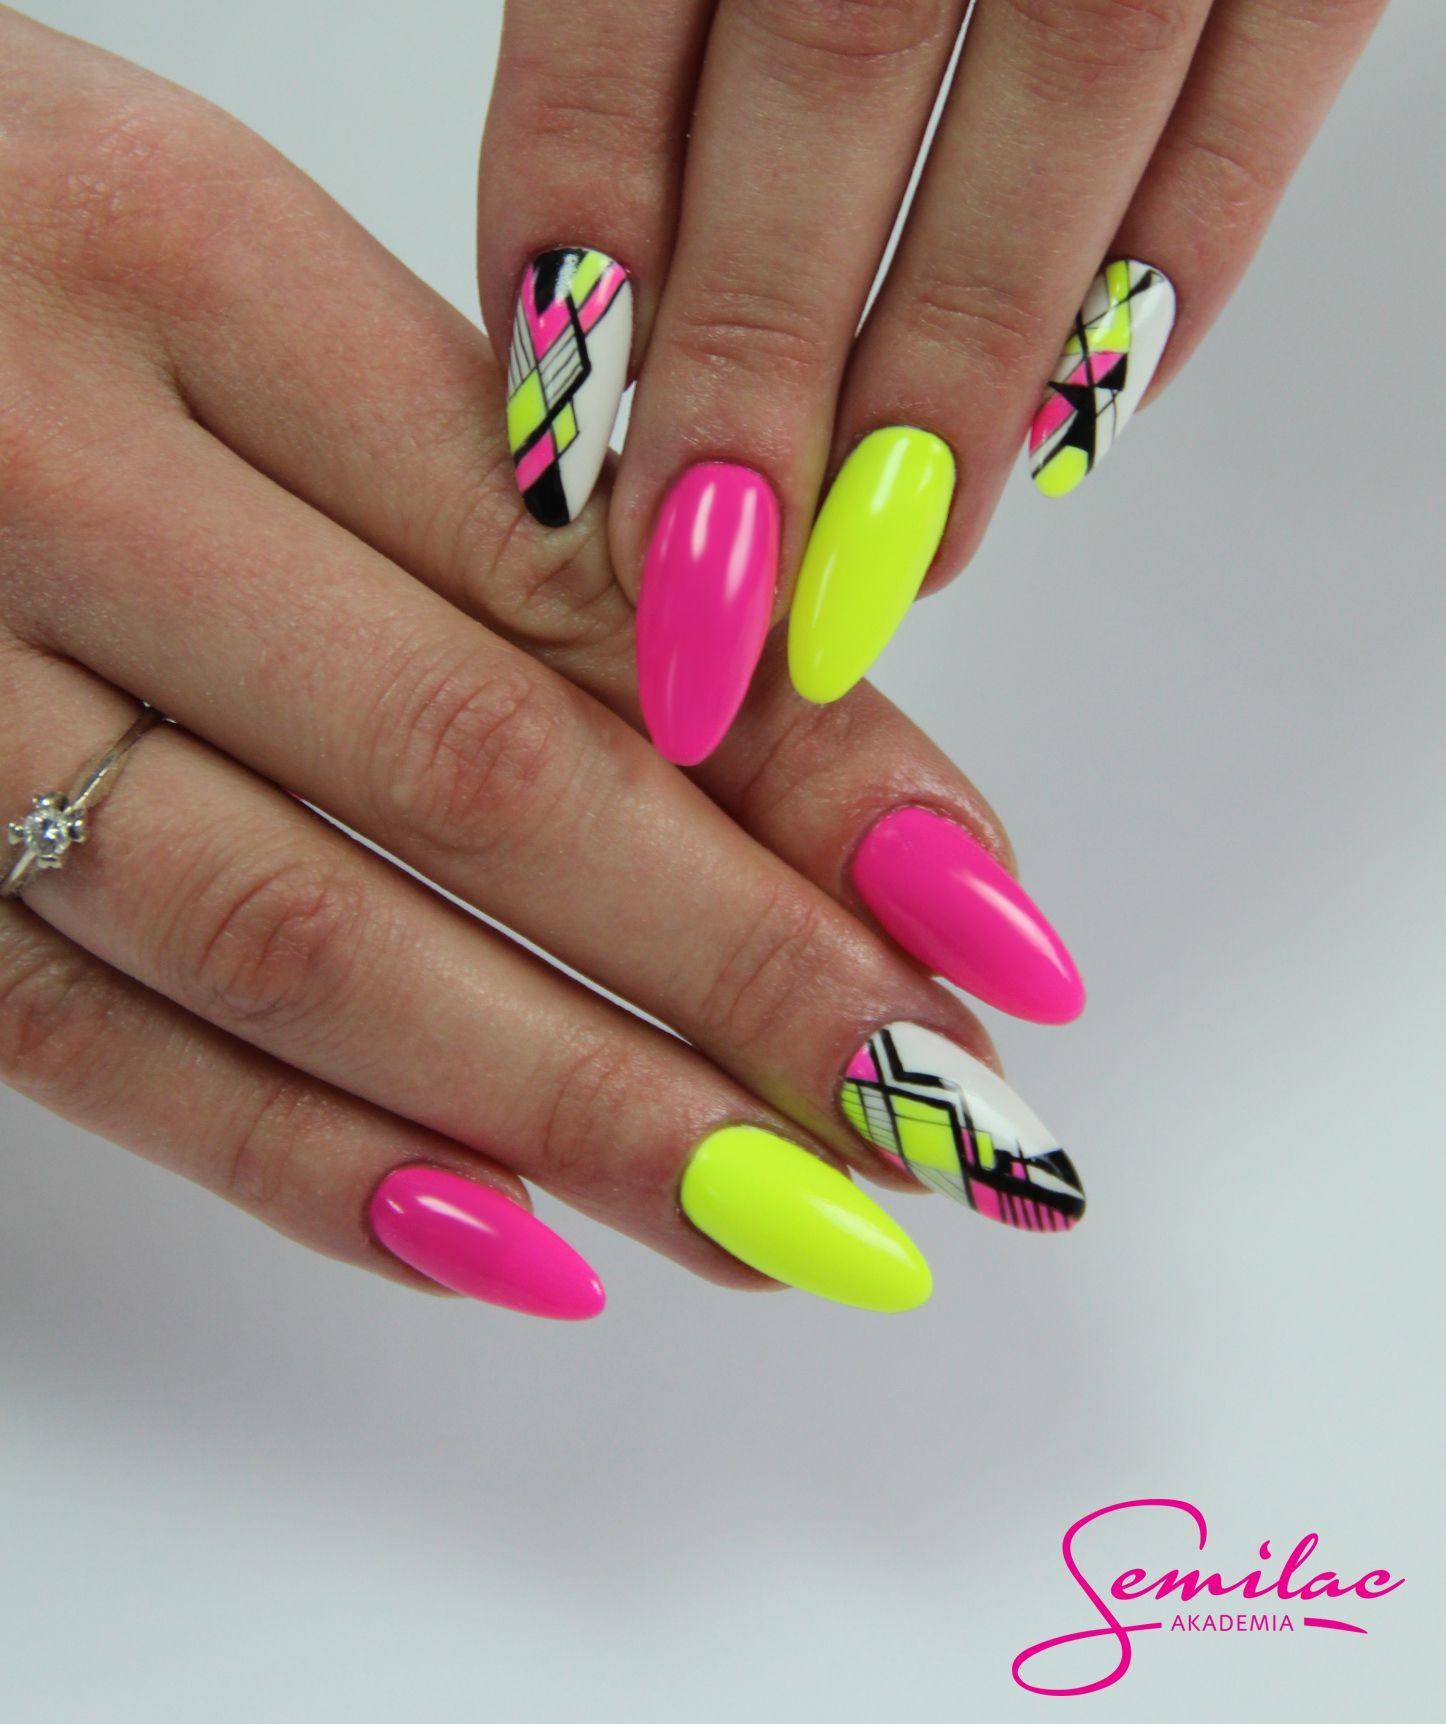 Gelové Nehty Neonové Barvy